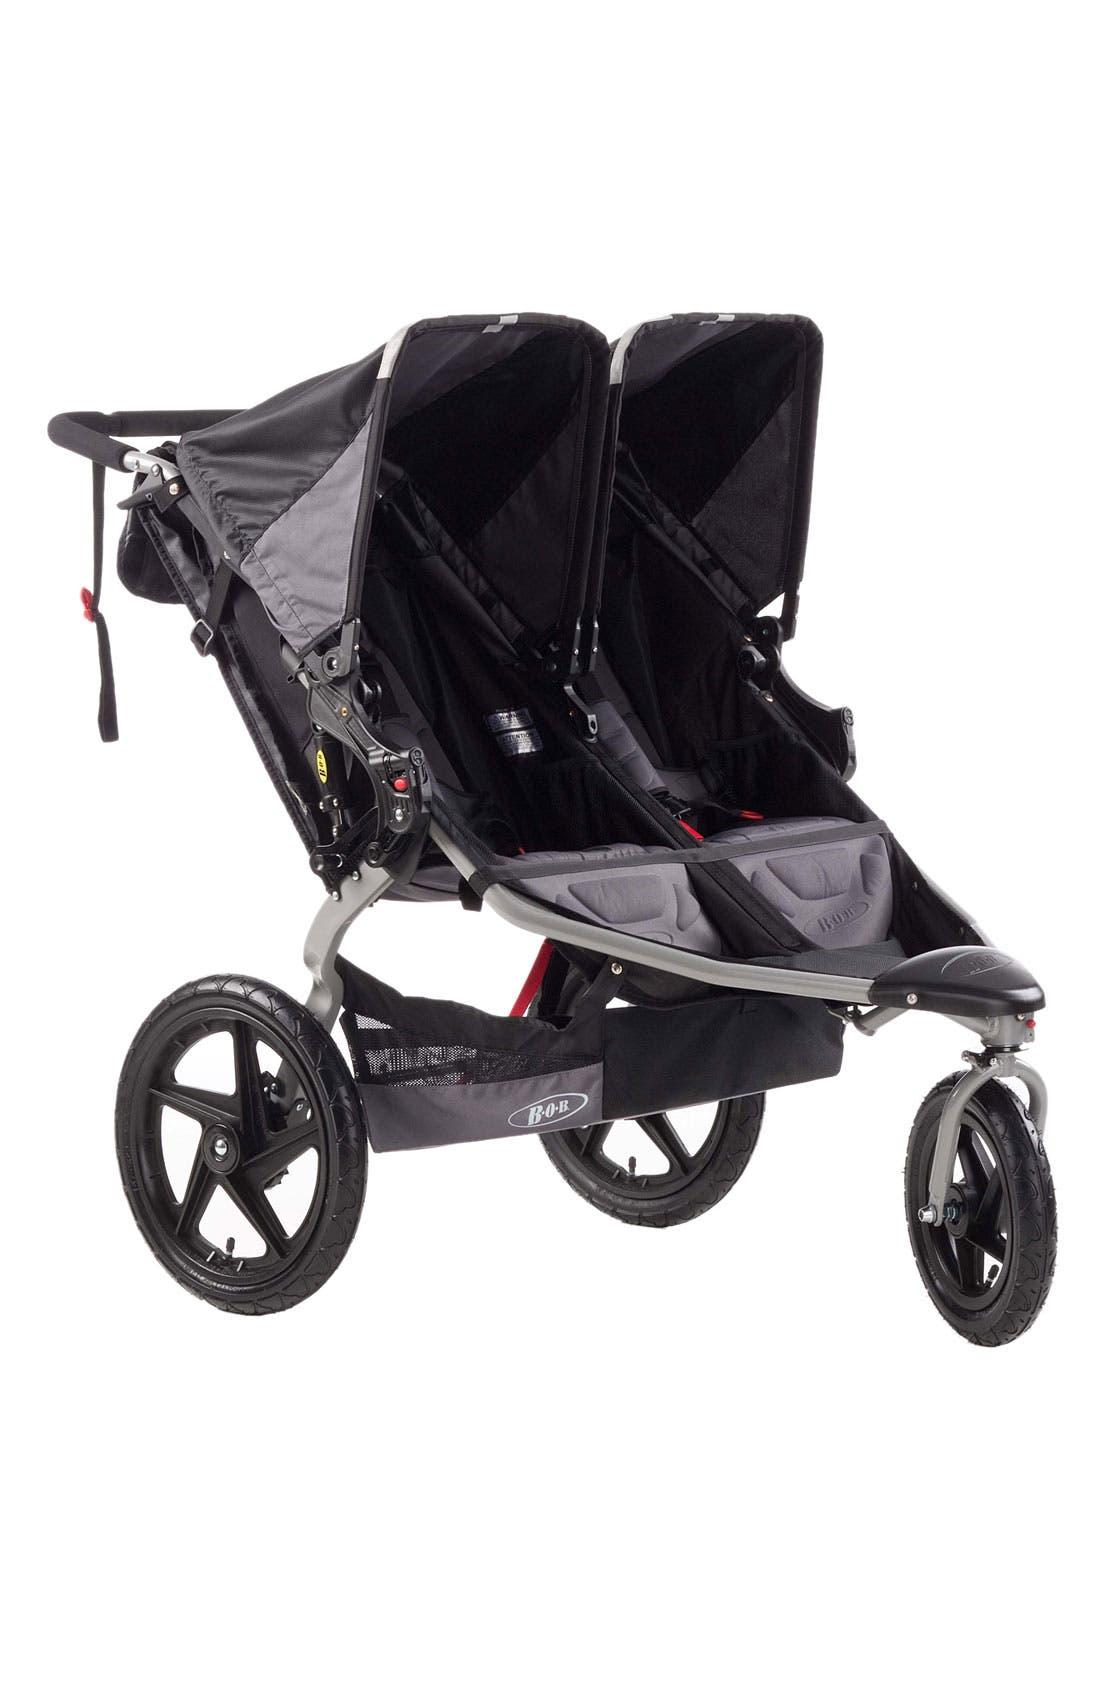 Main Image - BOB 'Revolution Duallie SE' Stroller